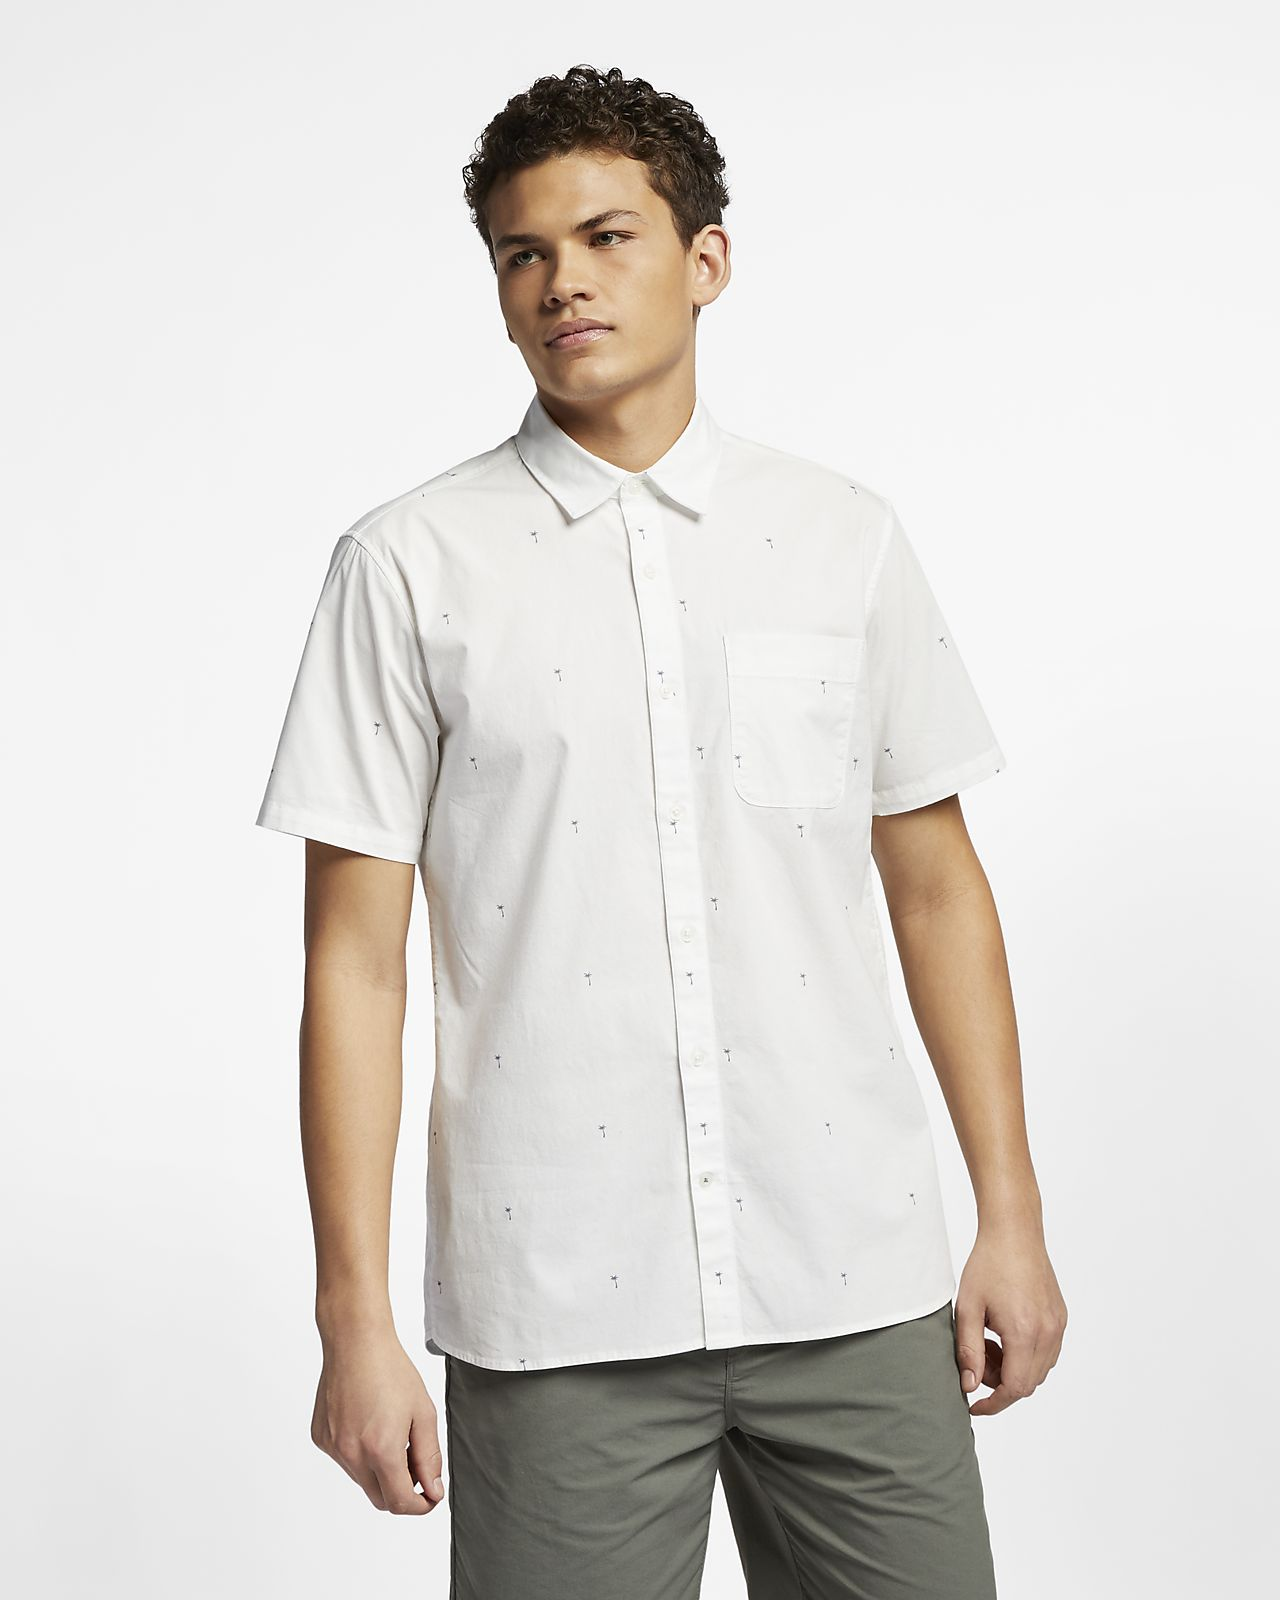 Hurley Palms Men's Short-Sleeve Shirt